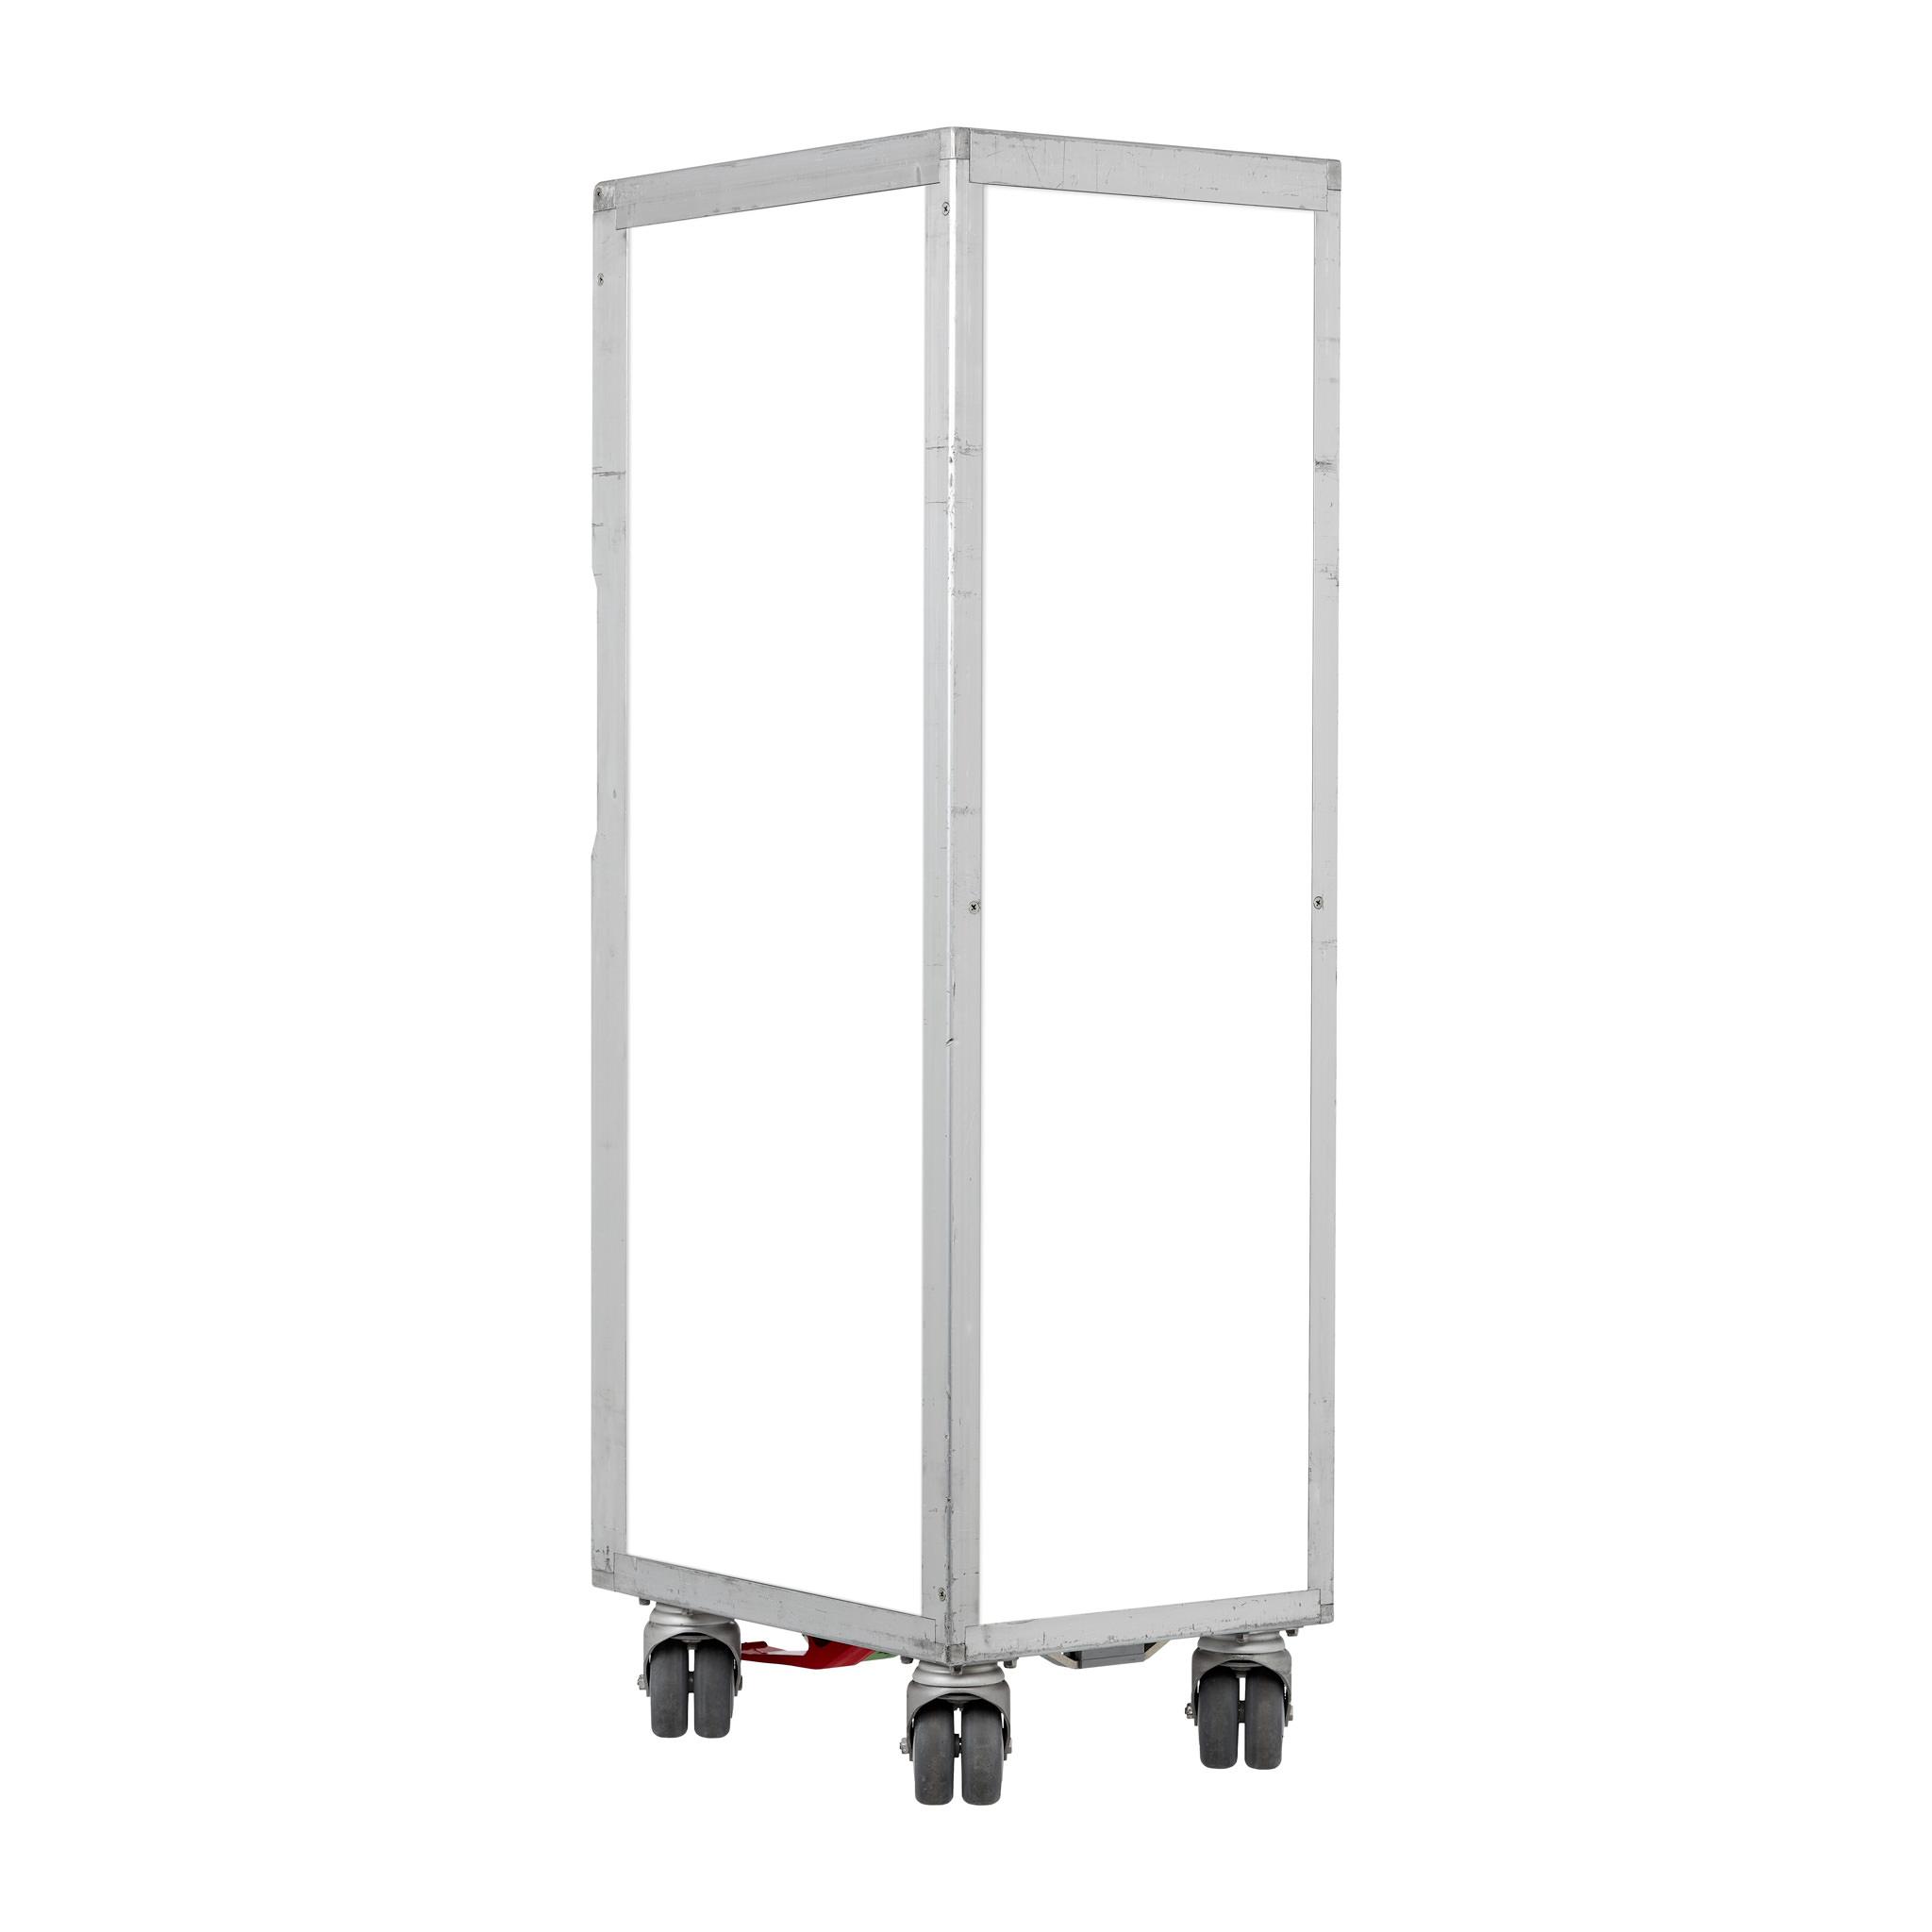 Trolleypaket Whiteboard inkl. Büro & Home-Office Ausstattung